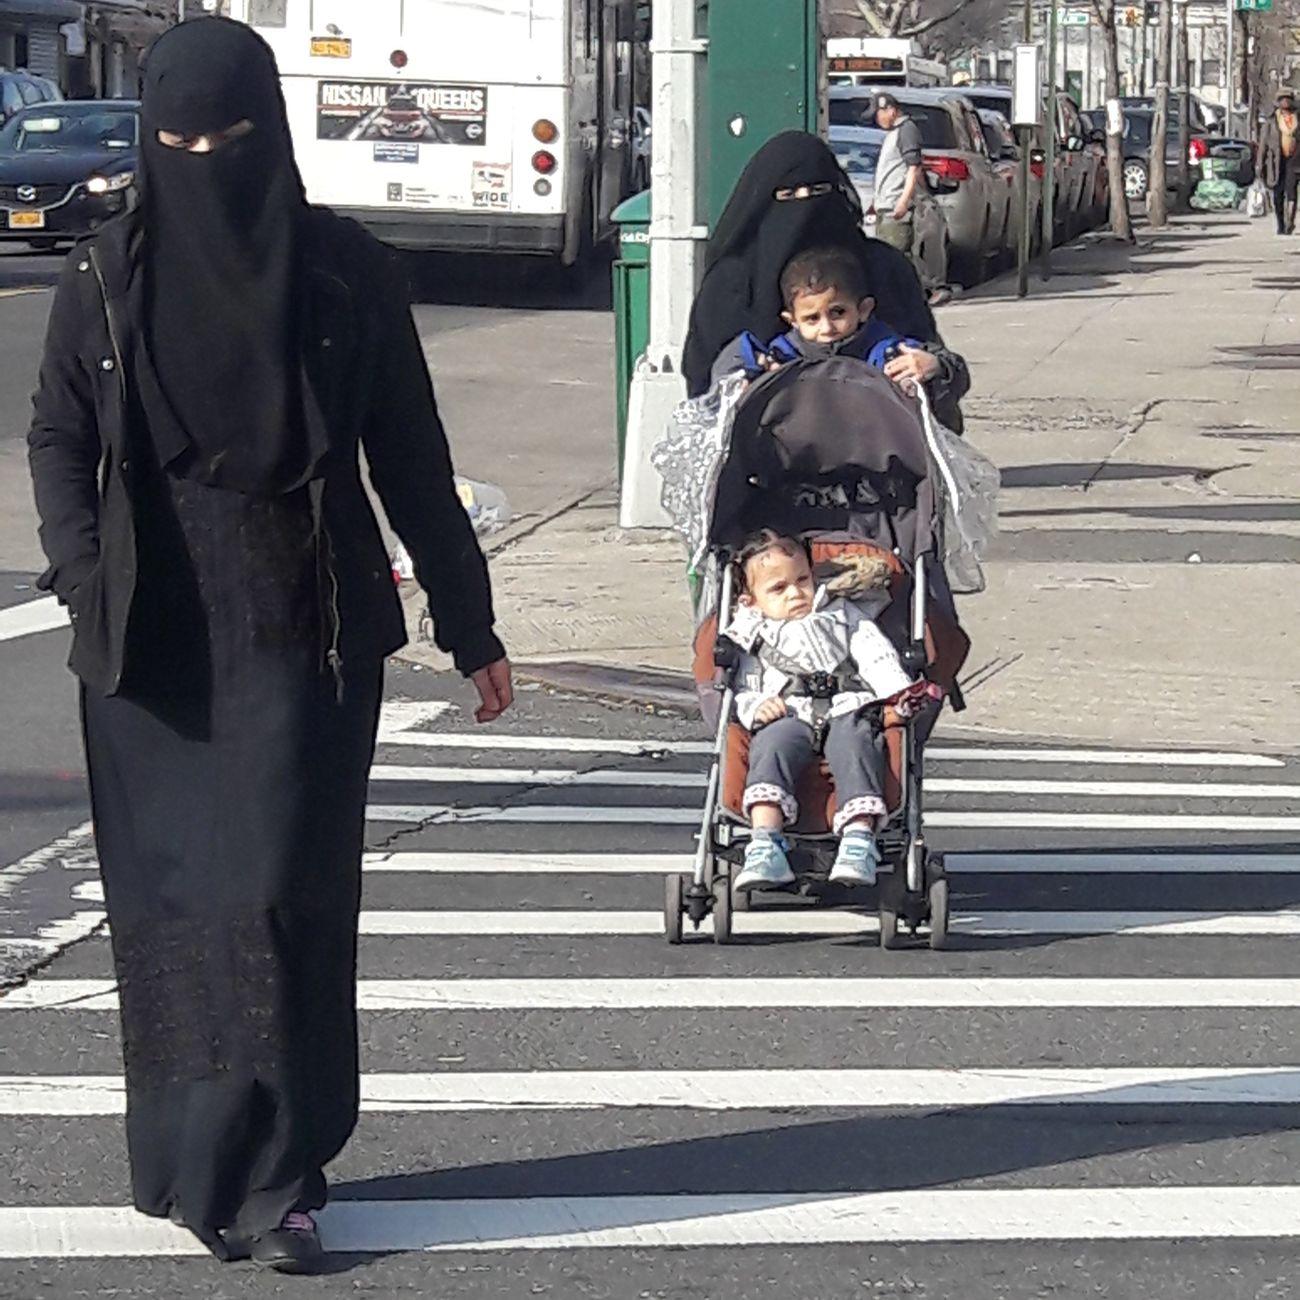 Muslim Woman Muslim Culture Muslimahfashion Lifestyles Wayoflife Queens NYC Muslim Children Freedom Of Expression The American Dream Street Photography Eyem Photography Newyorkcityphotographer EyemPhotographer Women Around The World